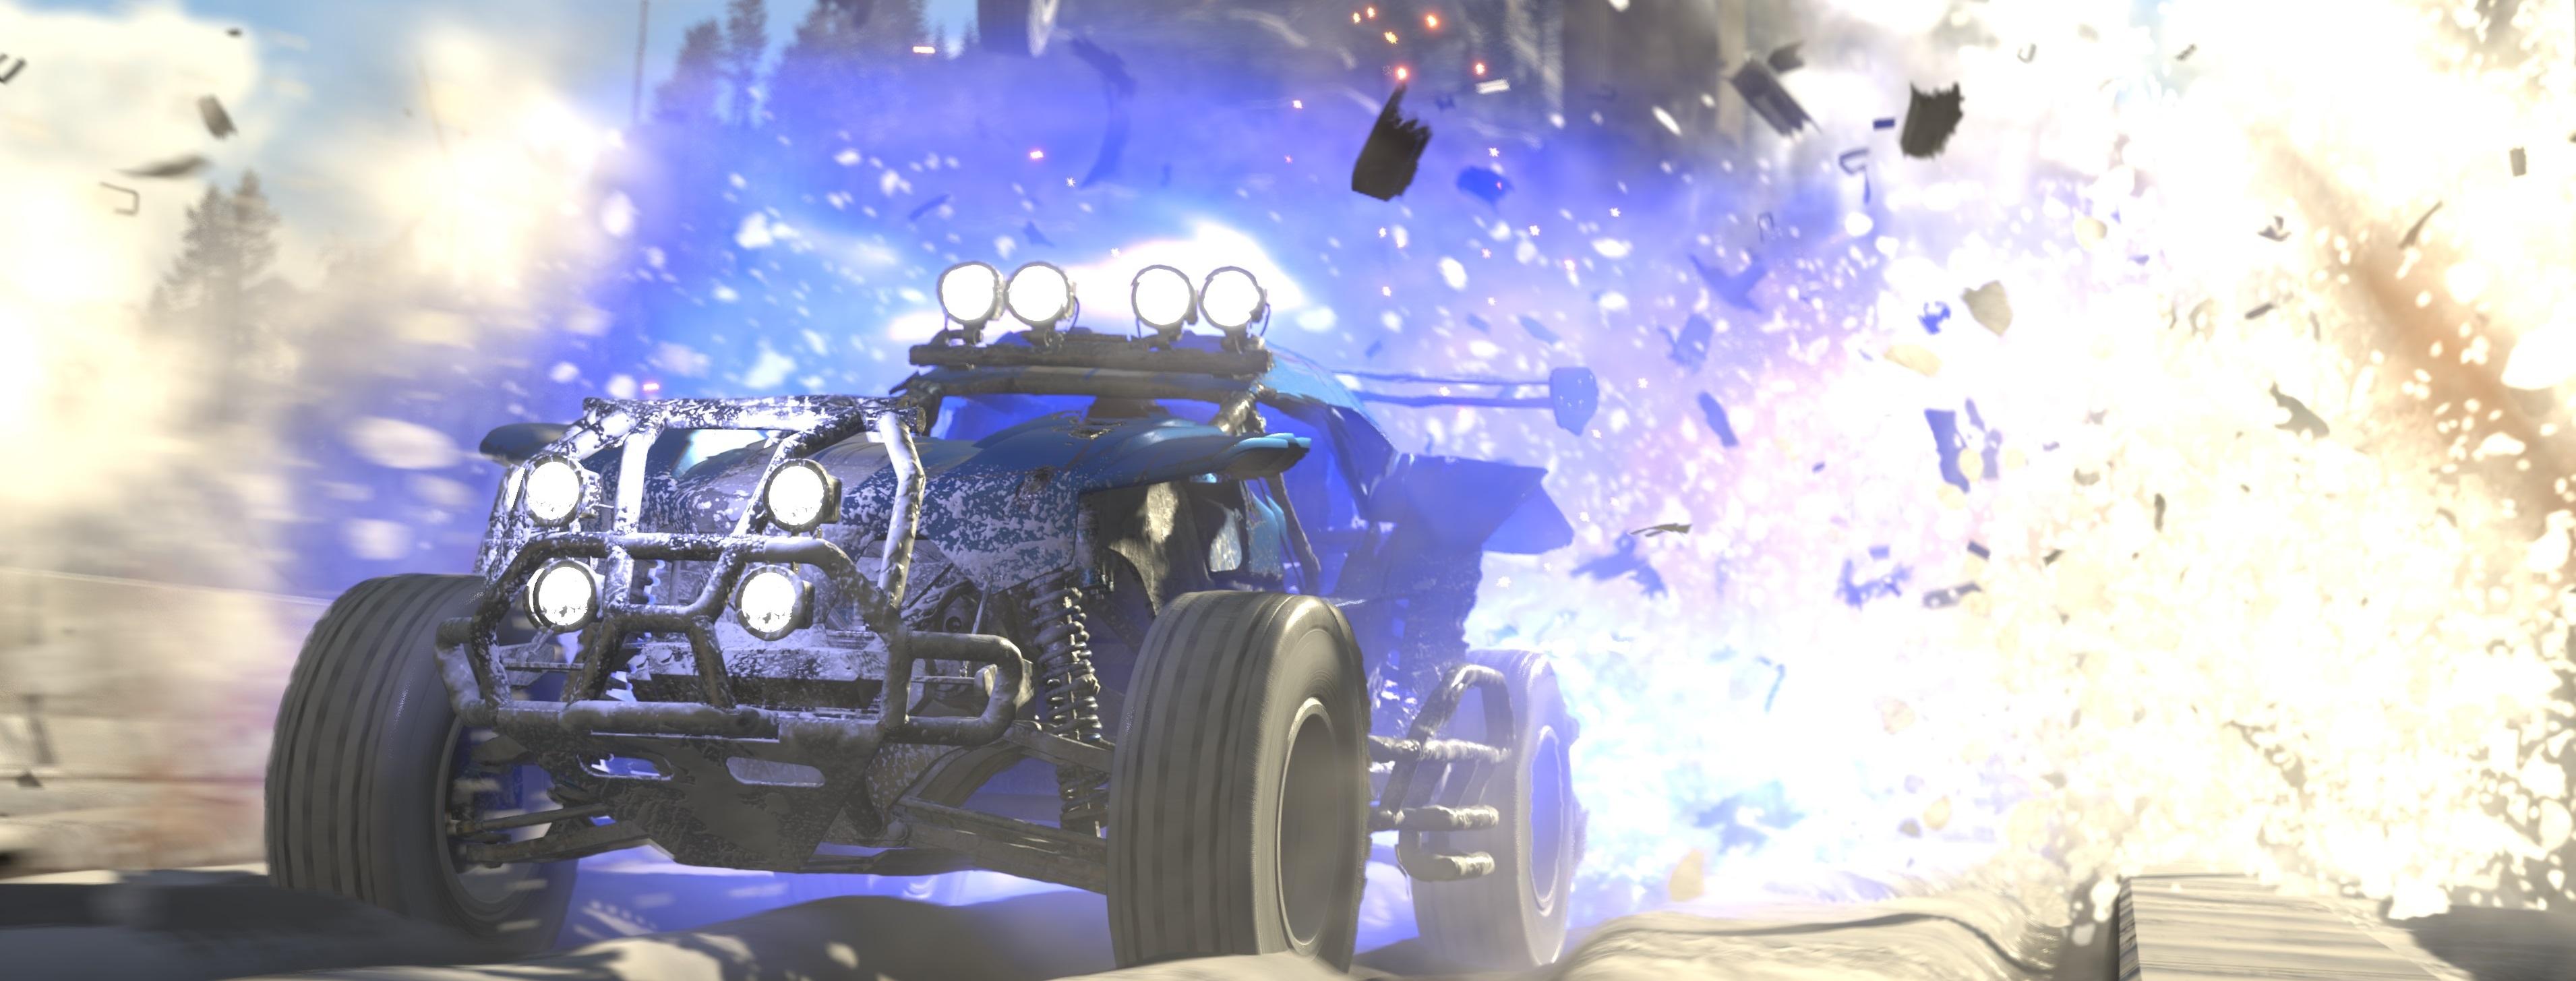 Test Onrush PS4 Pro - Image 1